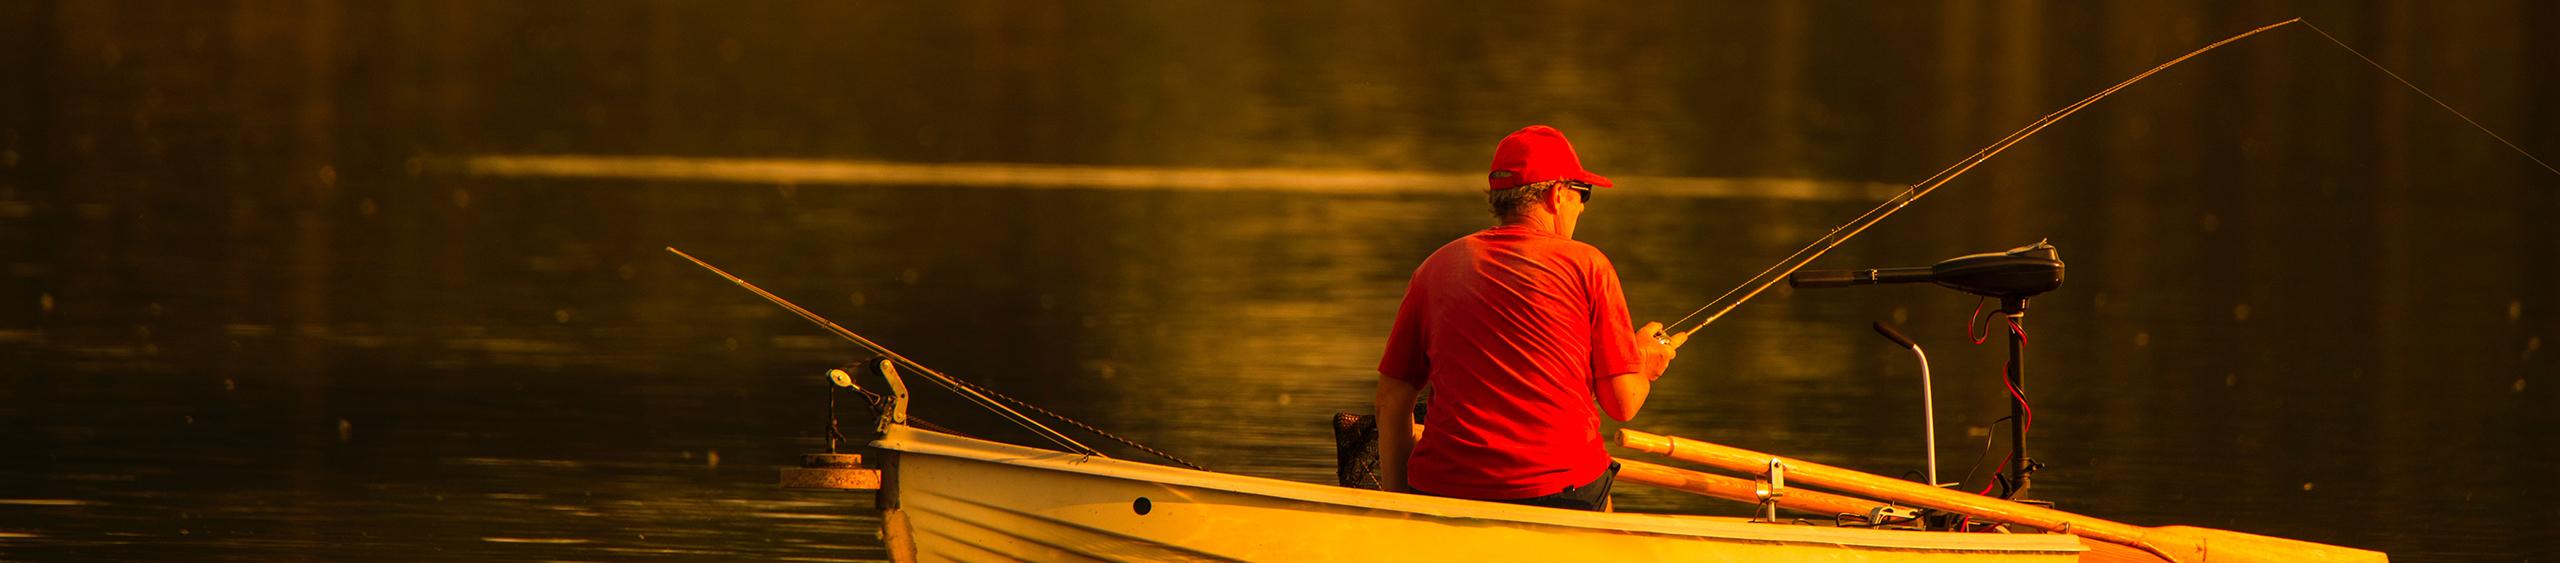 leech lake fishing report